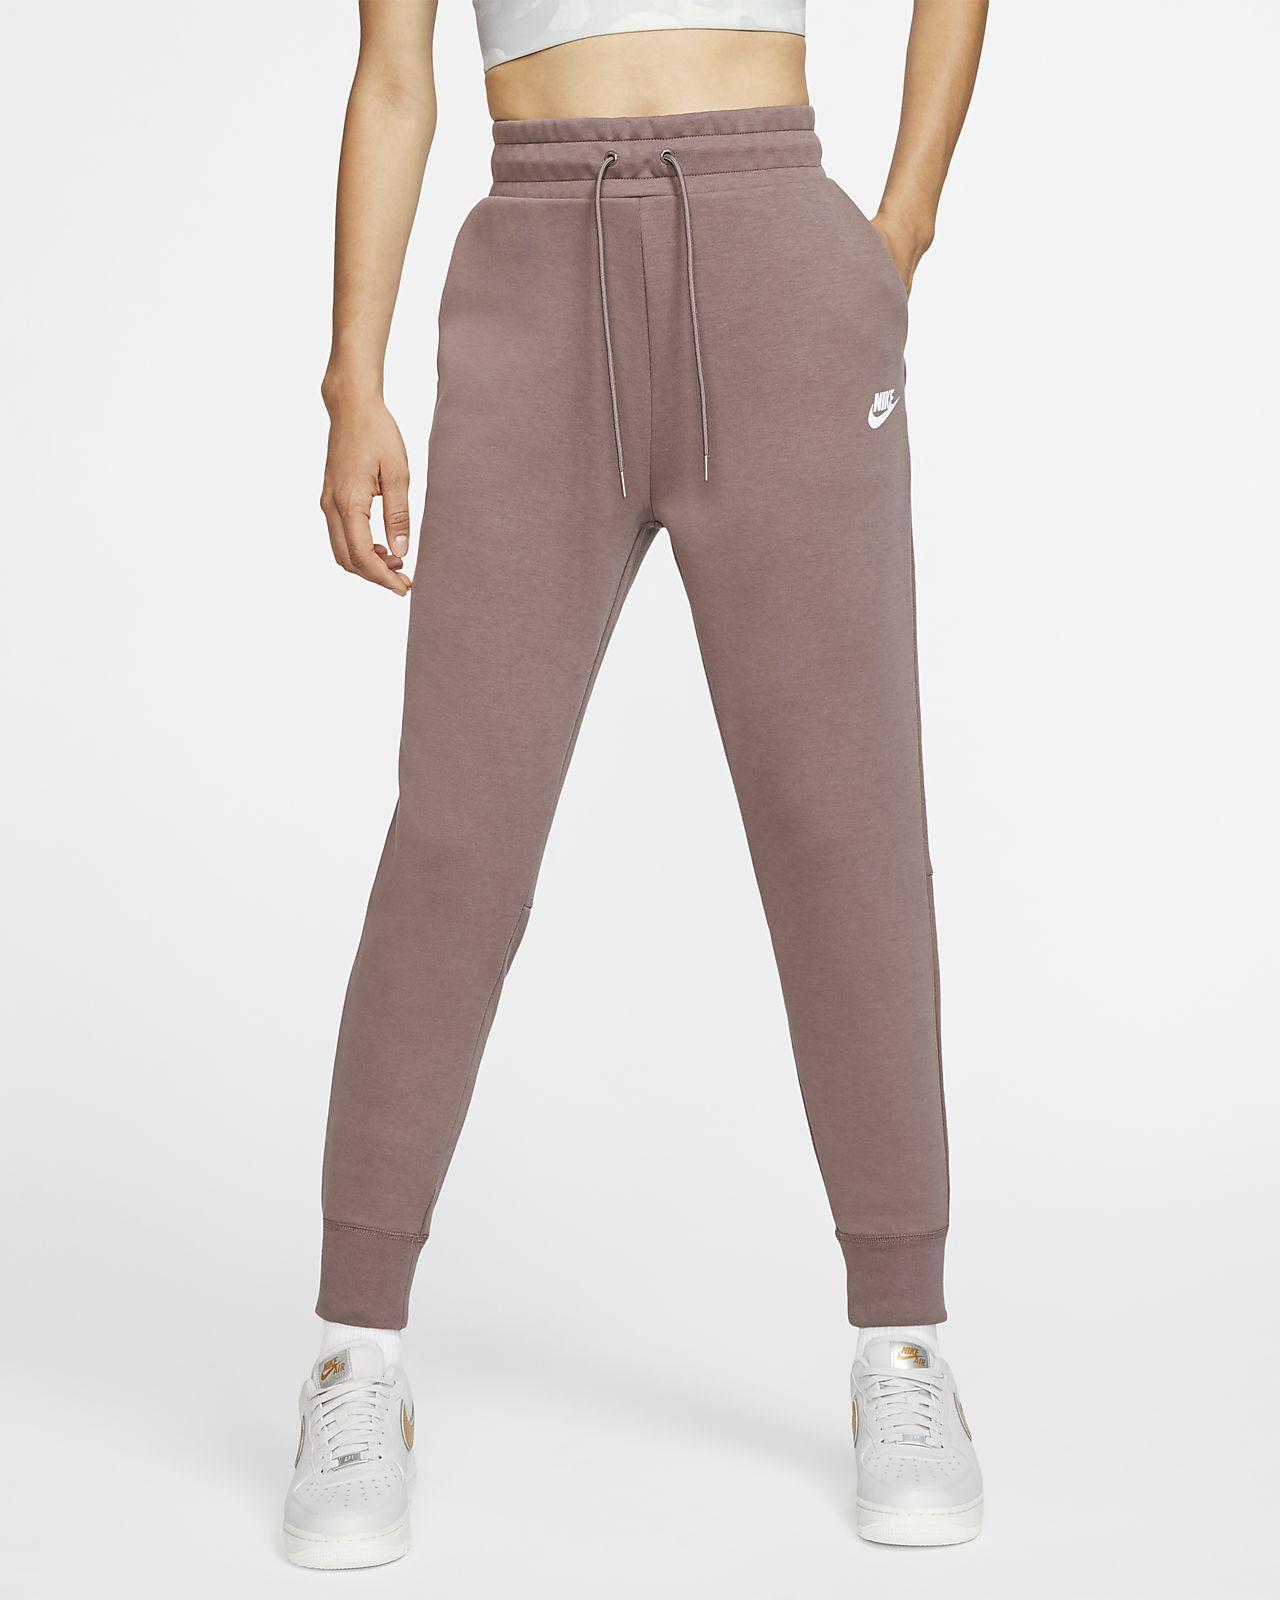 Damen Hose Jogginghose  Sweatpants Fitness Freizeit Sport Training Stern  AM 270